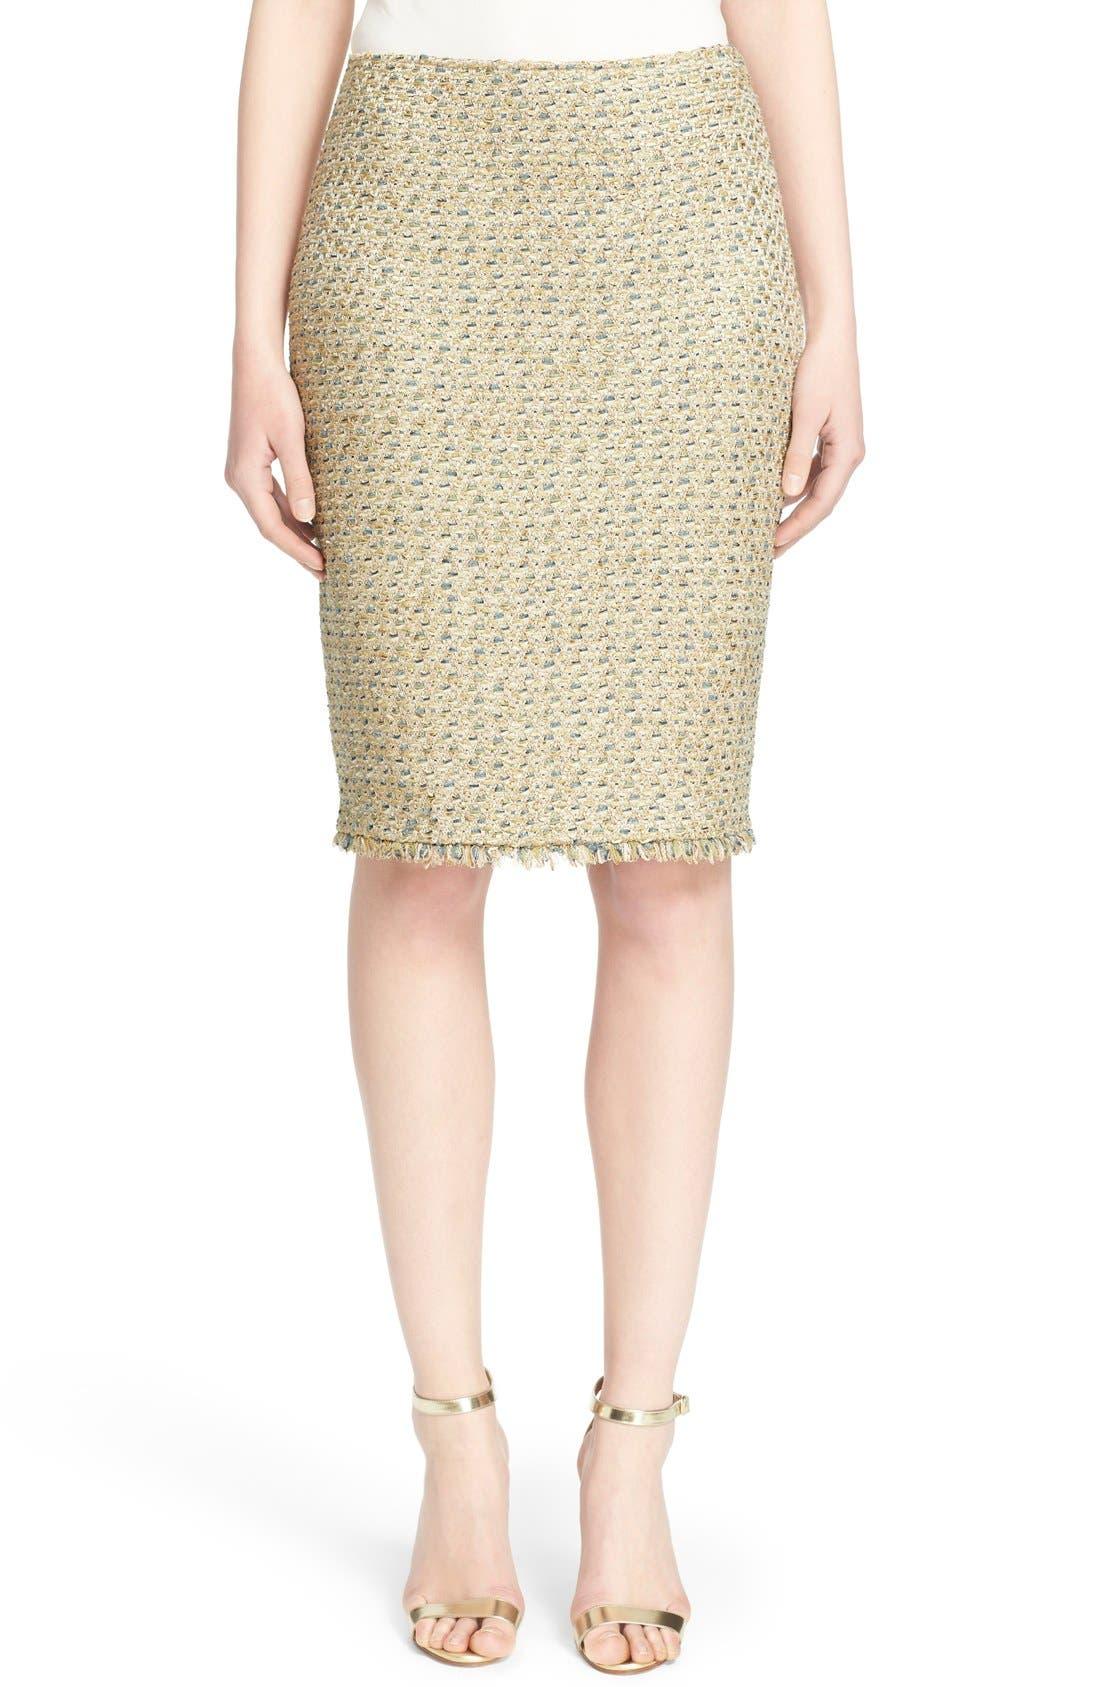 Alternate Image 1 Selected - St. John Collection Fringe Trim Raffia Knit Pencil Skirt